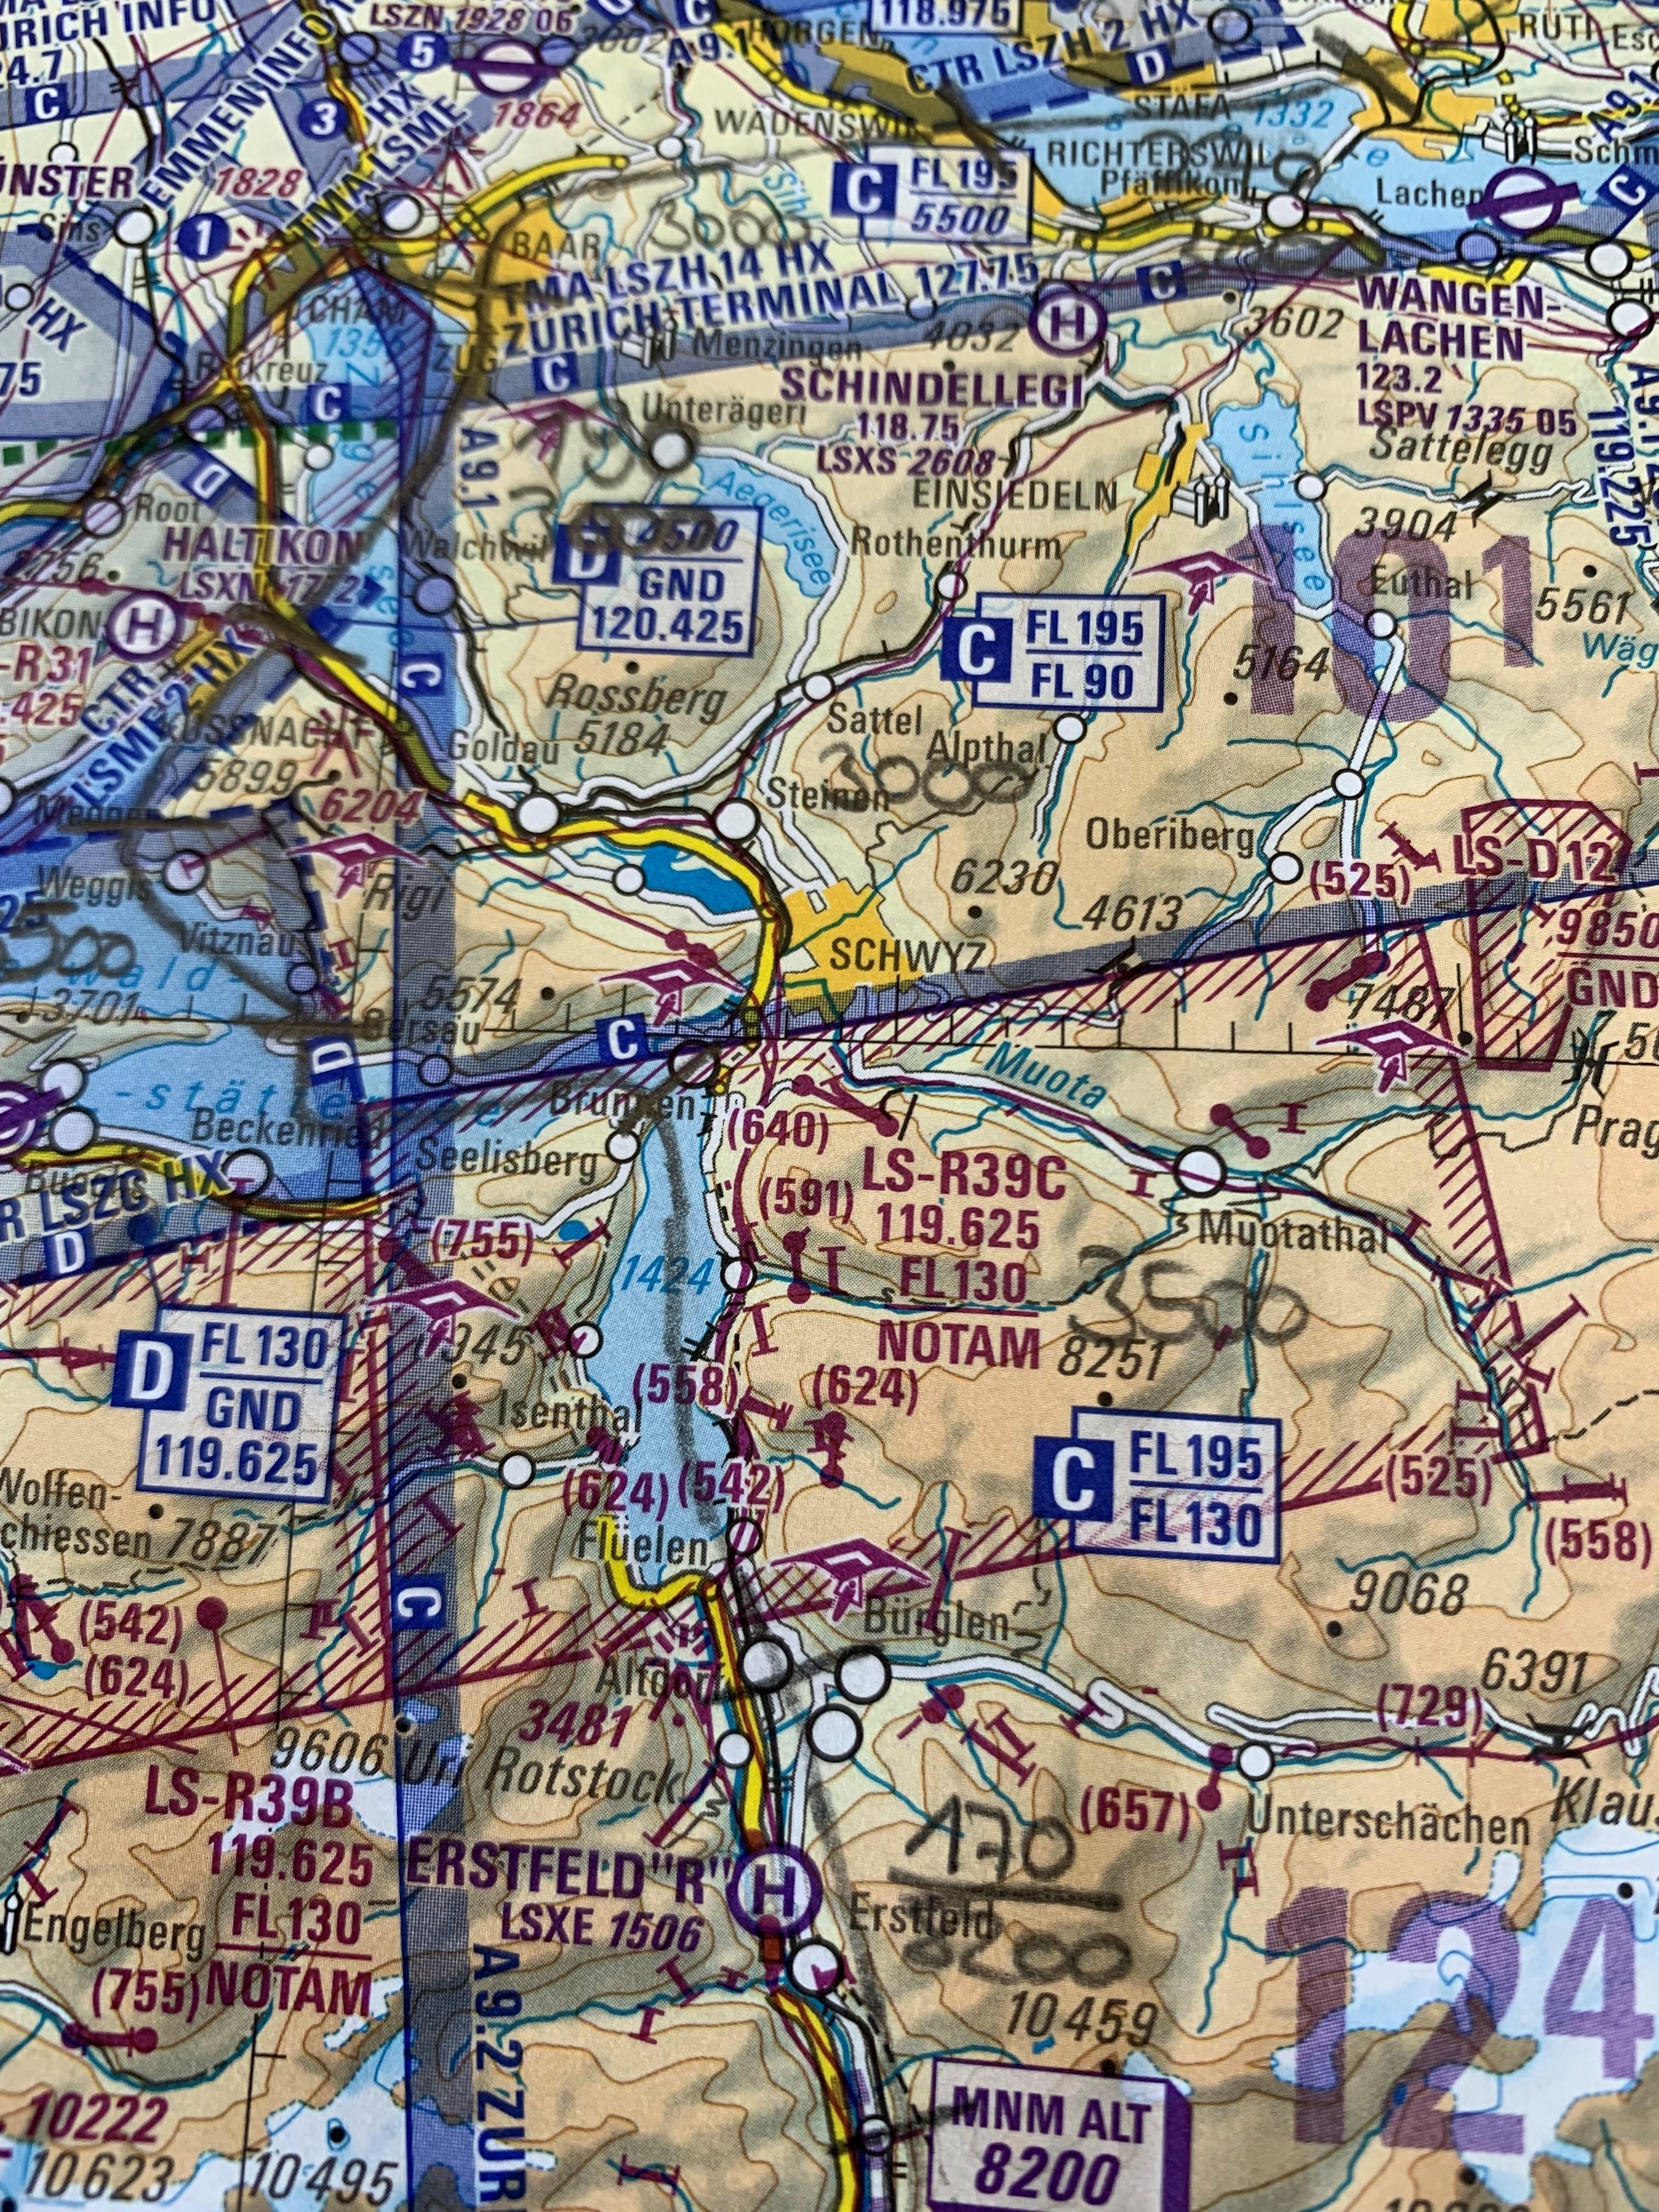 Luftfahrtkarte